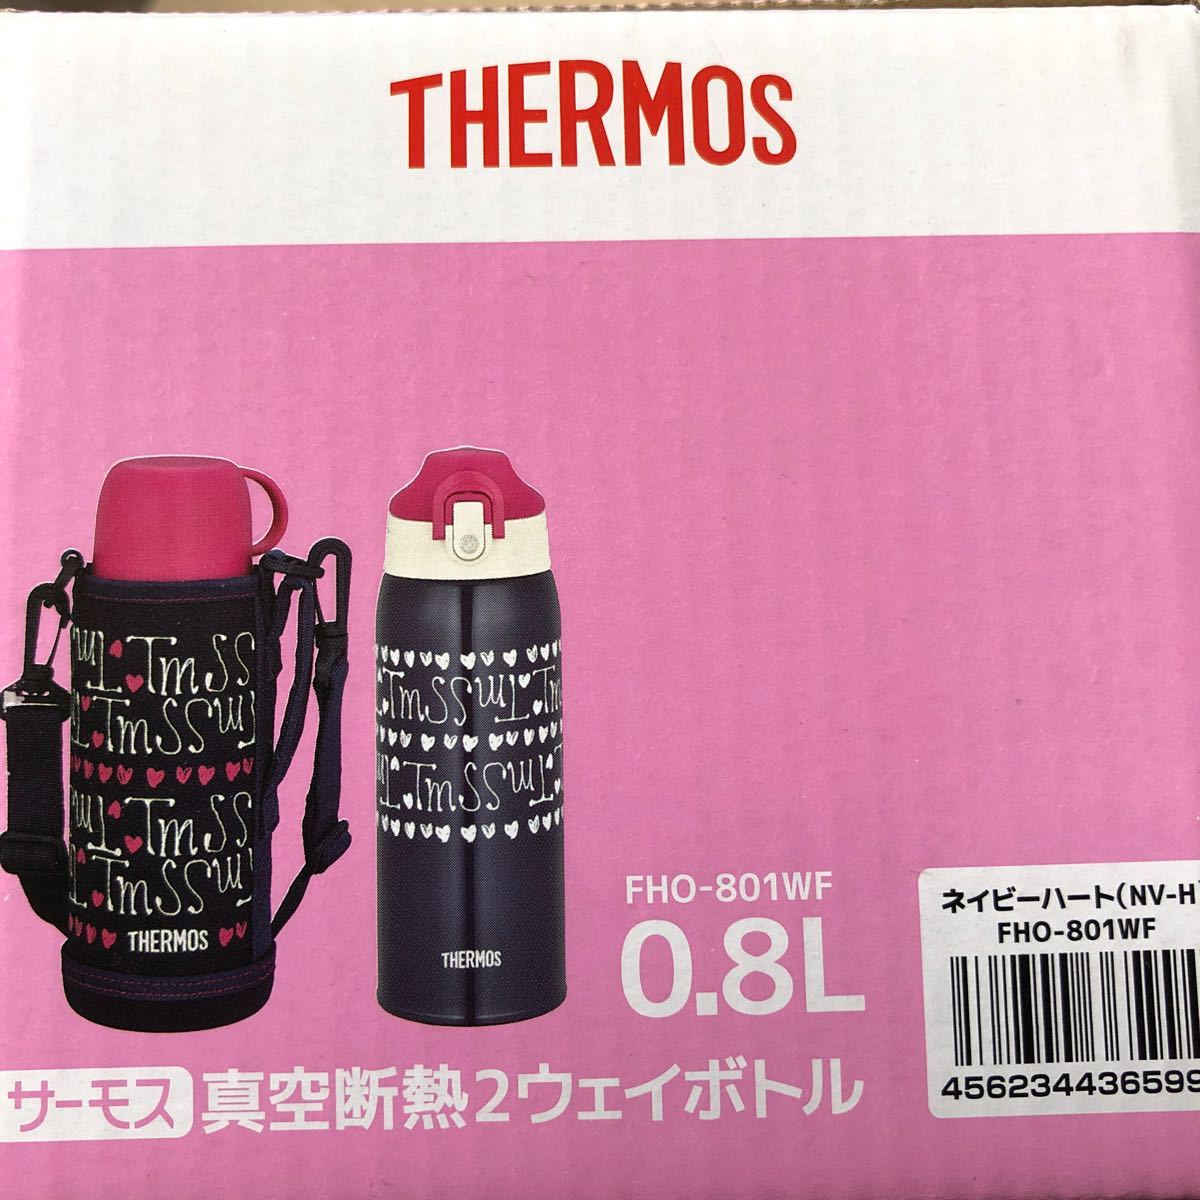 新品 サーモス 水筒 真空断熱 2ウェイボトル 0.8L/0.83L ネイビーハート FHO-801WF NV-H 女の子 女児